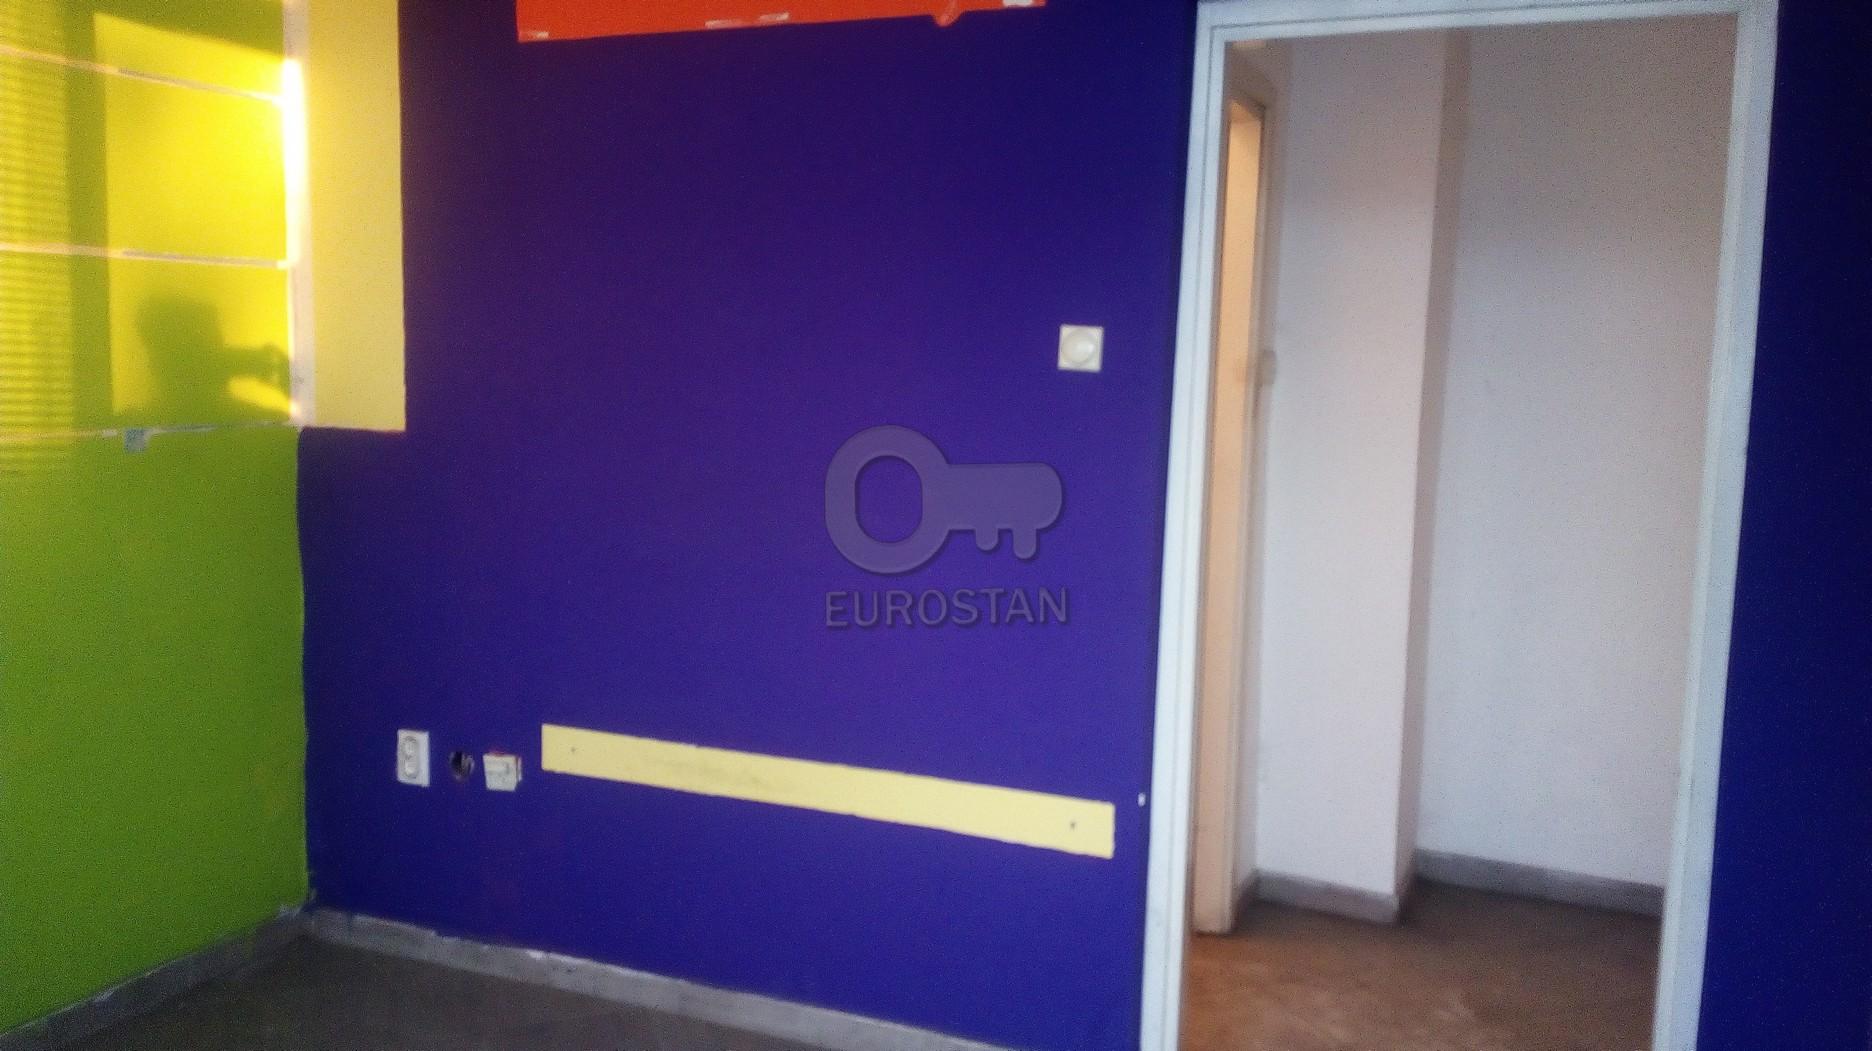 Poslovni prostor , Beograd (grad) , Izdavanje | Poslovni Prostor Čukarička Padina 100 Eur